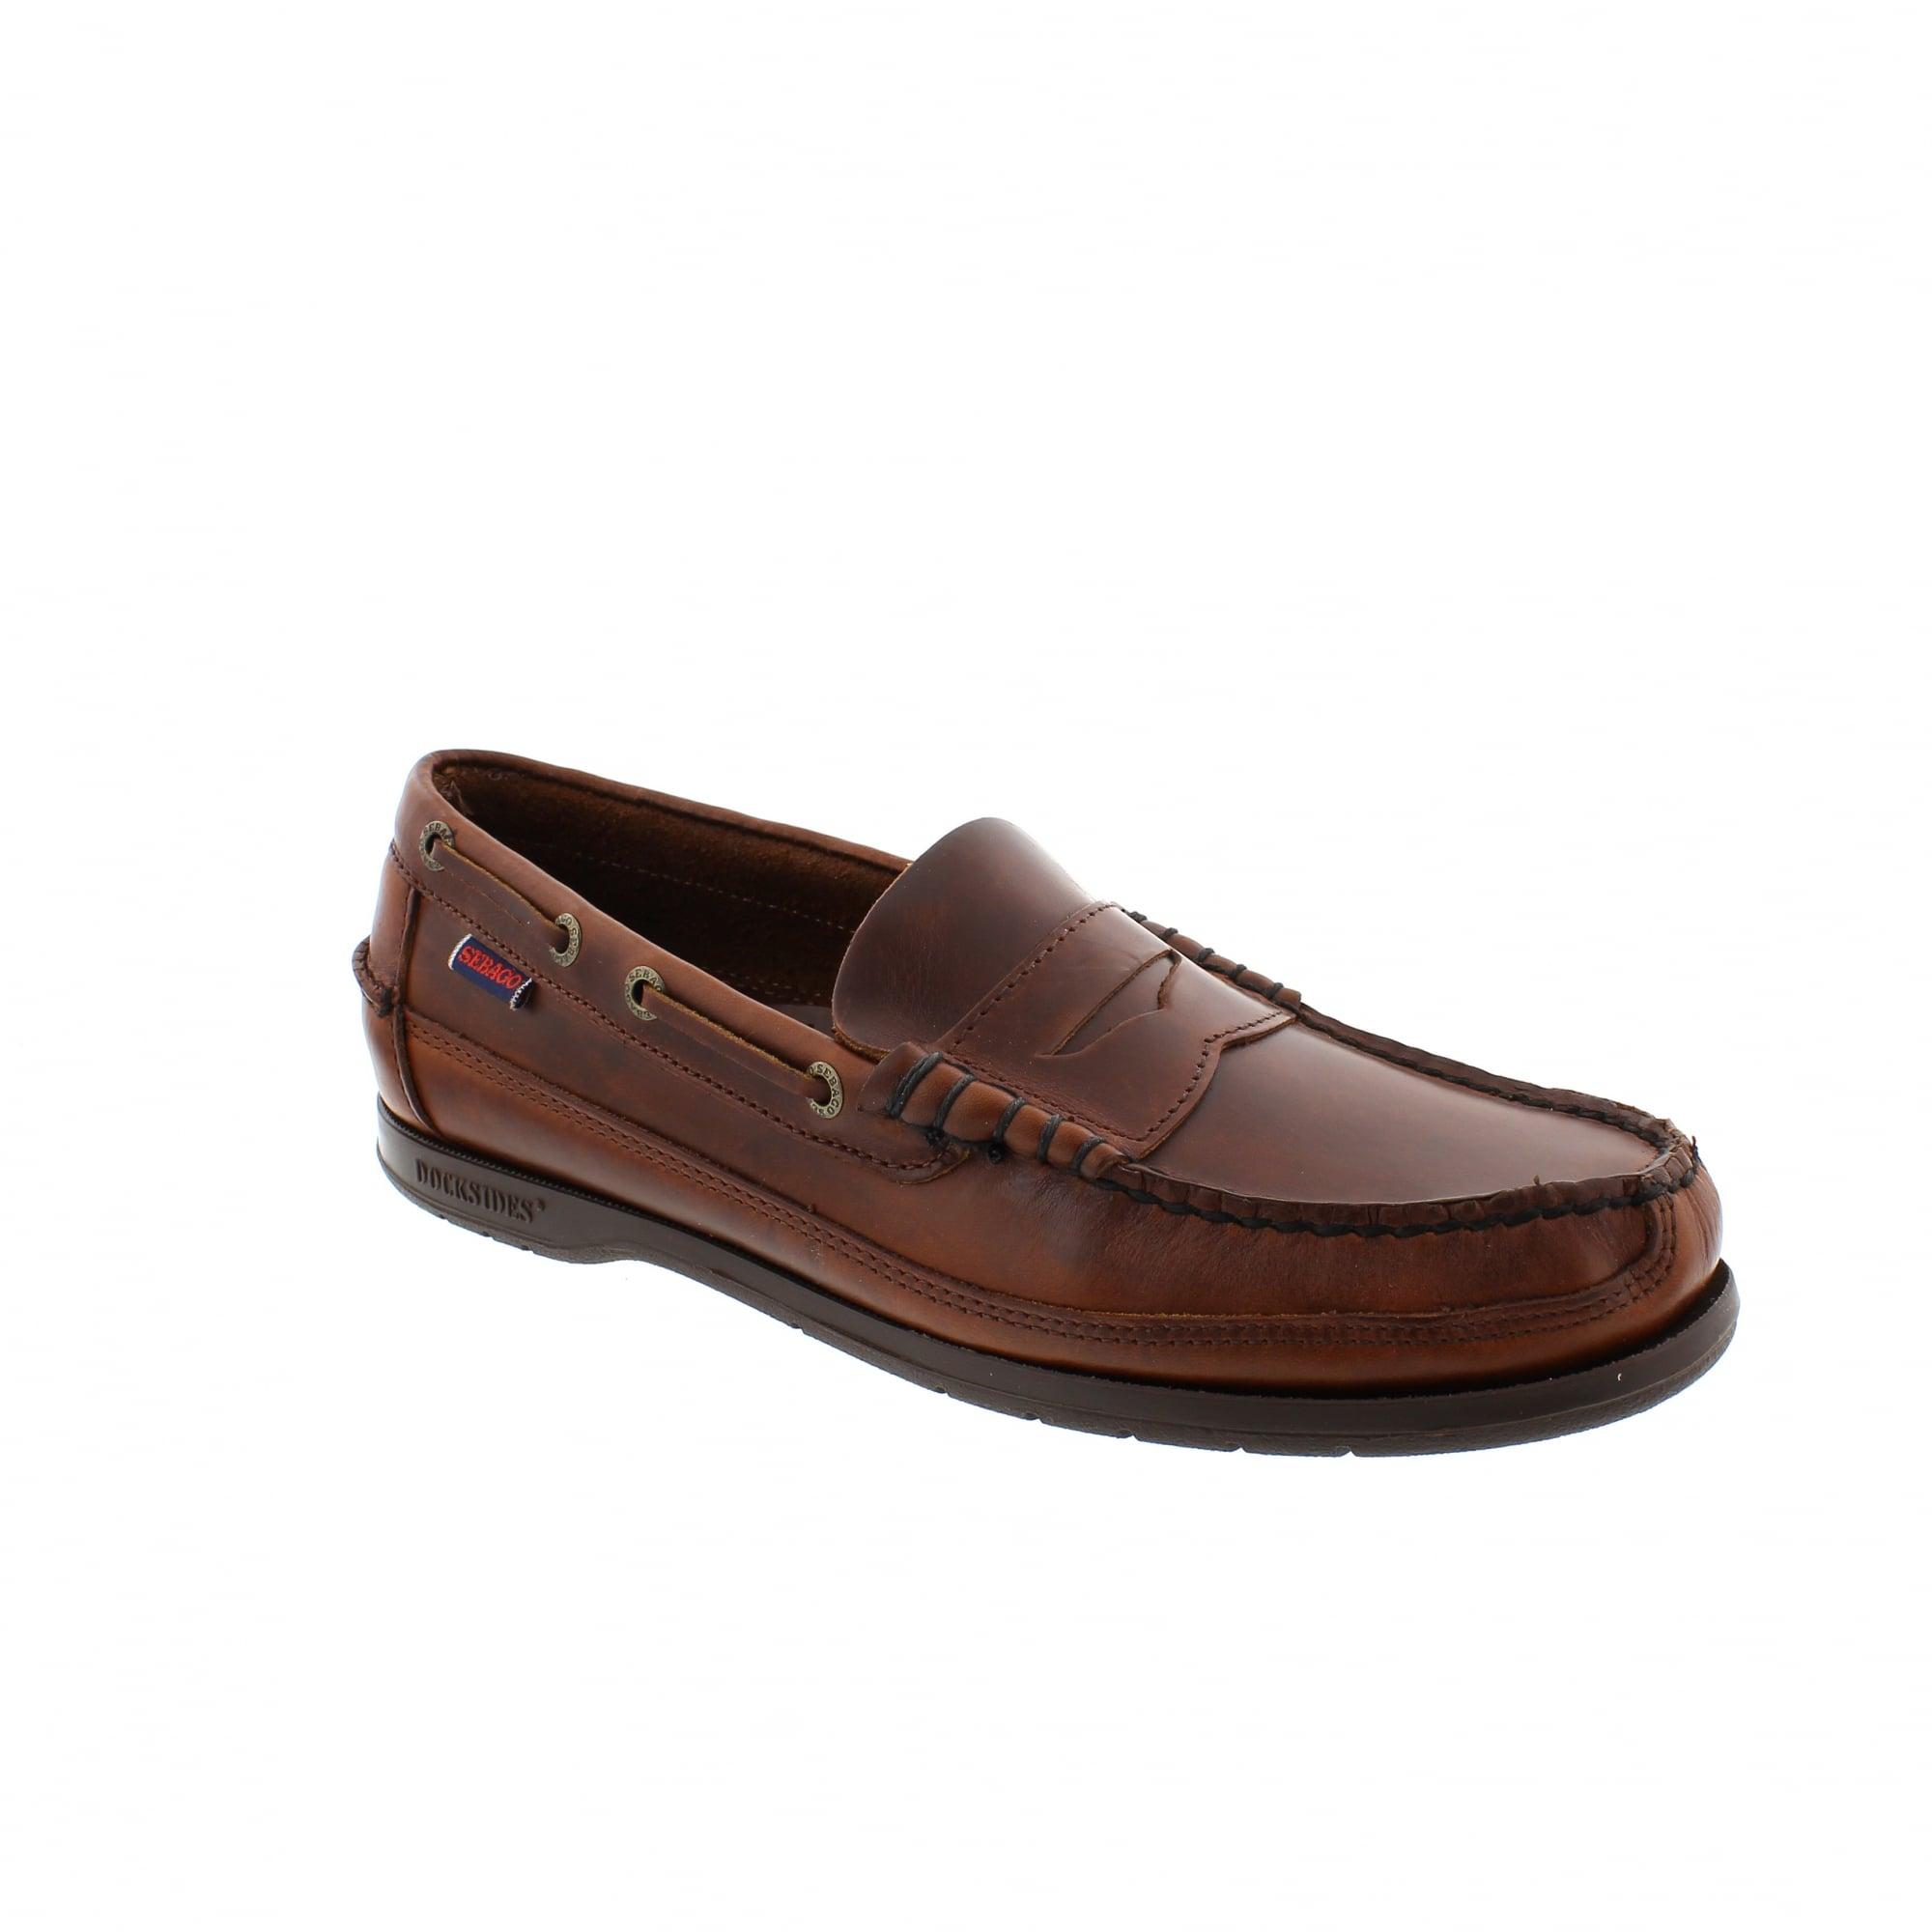 08731329ebe1e Sebago Sloop Boat Shoes Brown Leather Docksides | Rogerson Shoes